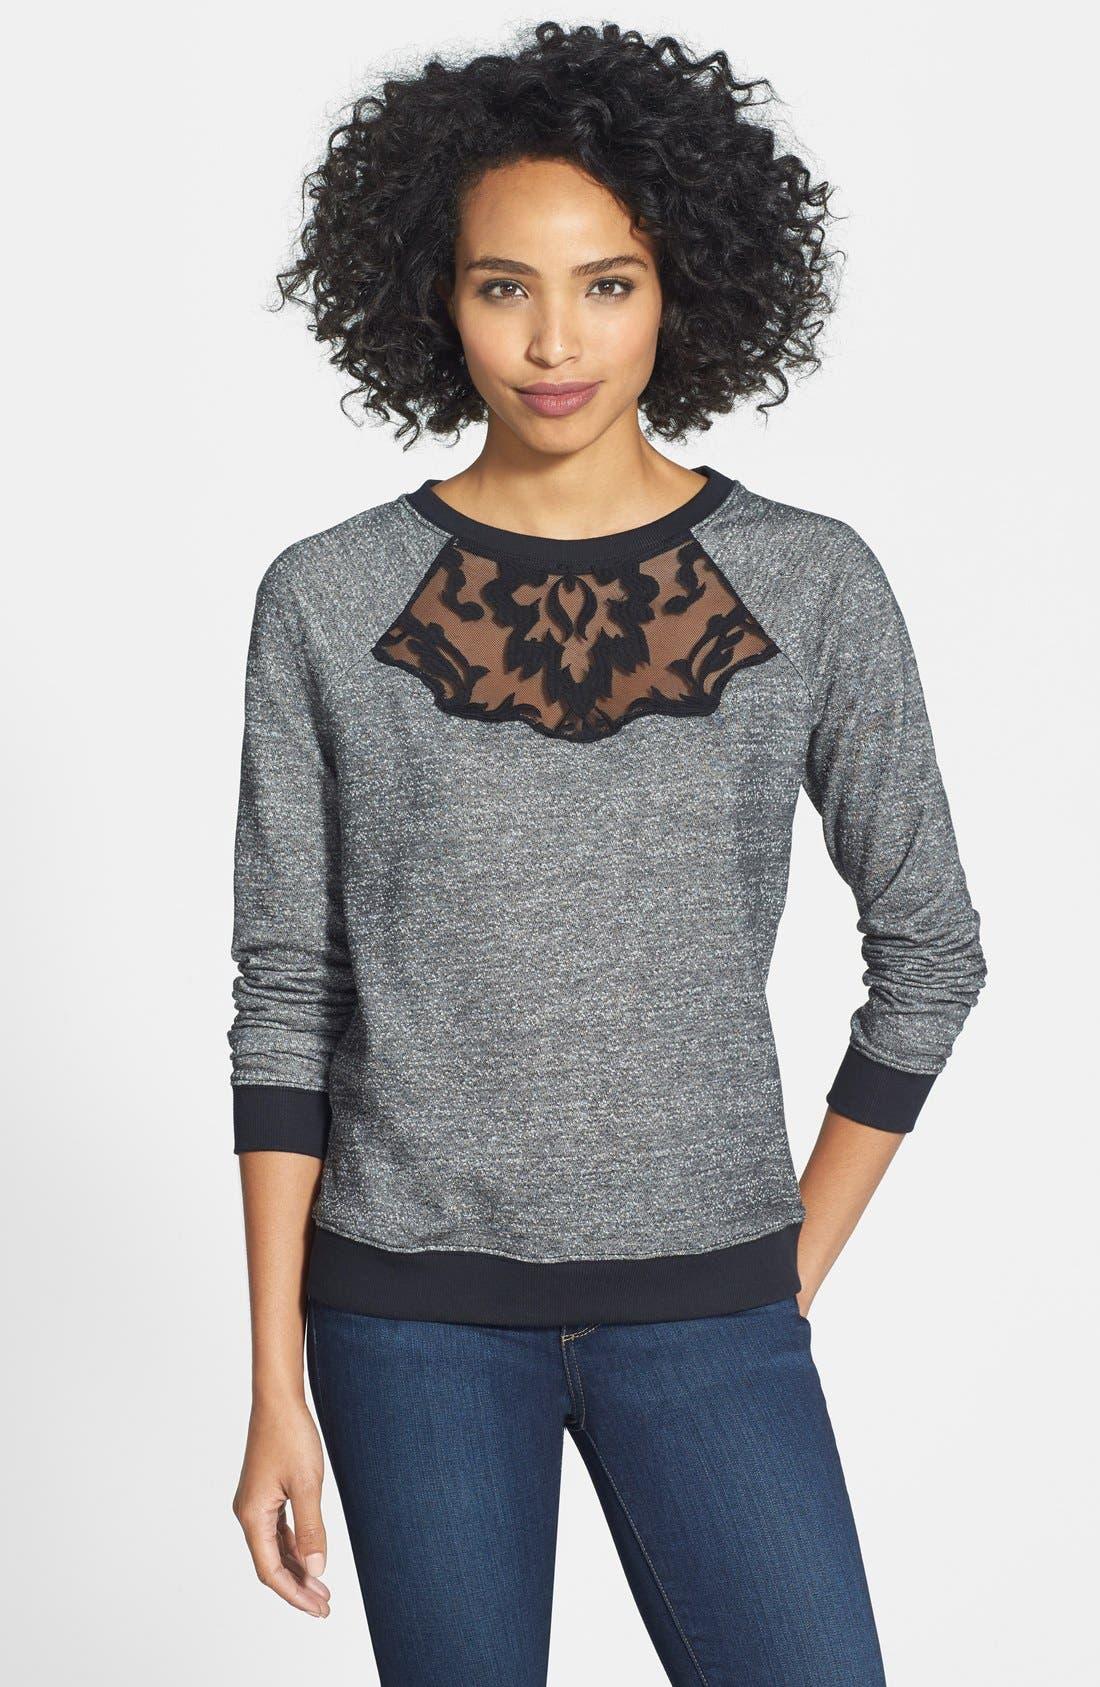 Alternate Image 1 Selected - NYDJ Embroidered Lace Crewneck Sweatshirt